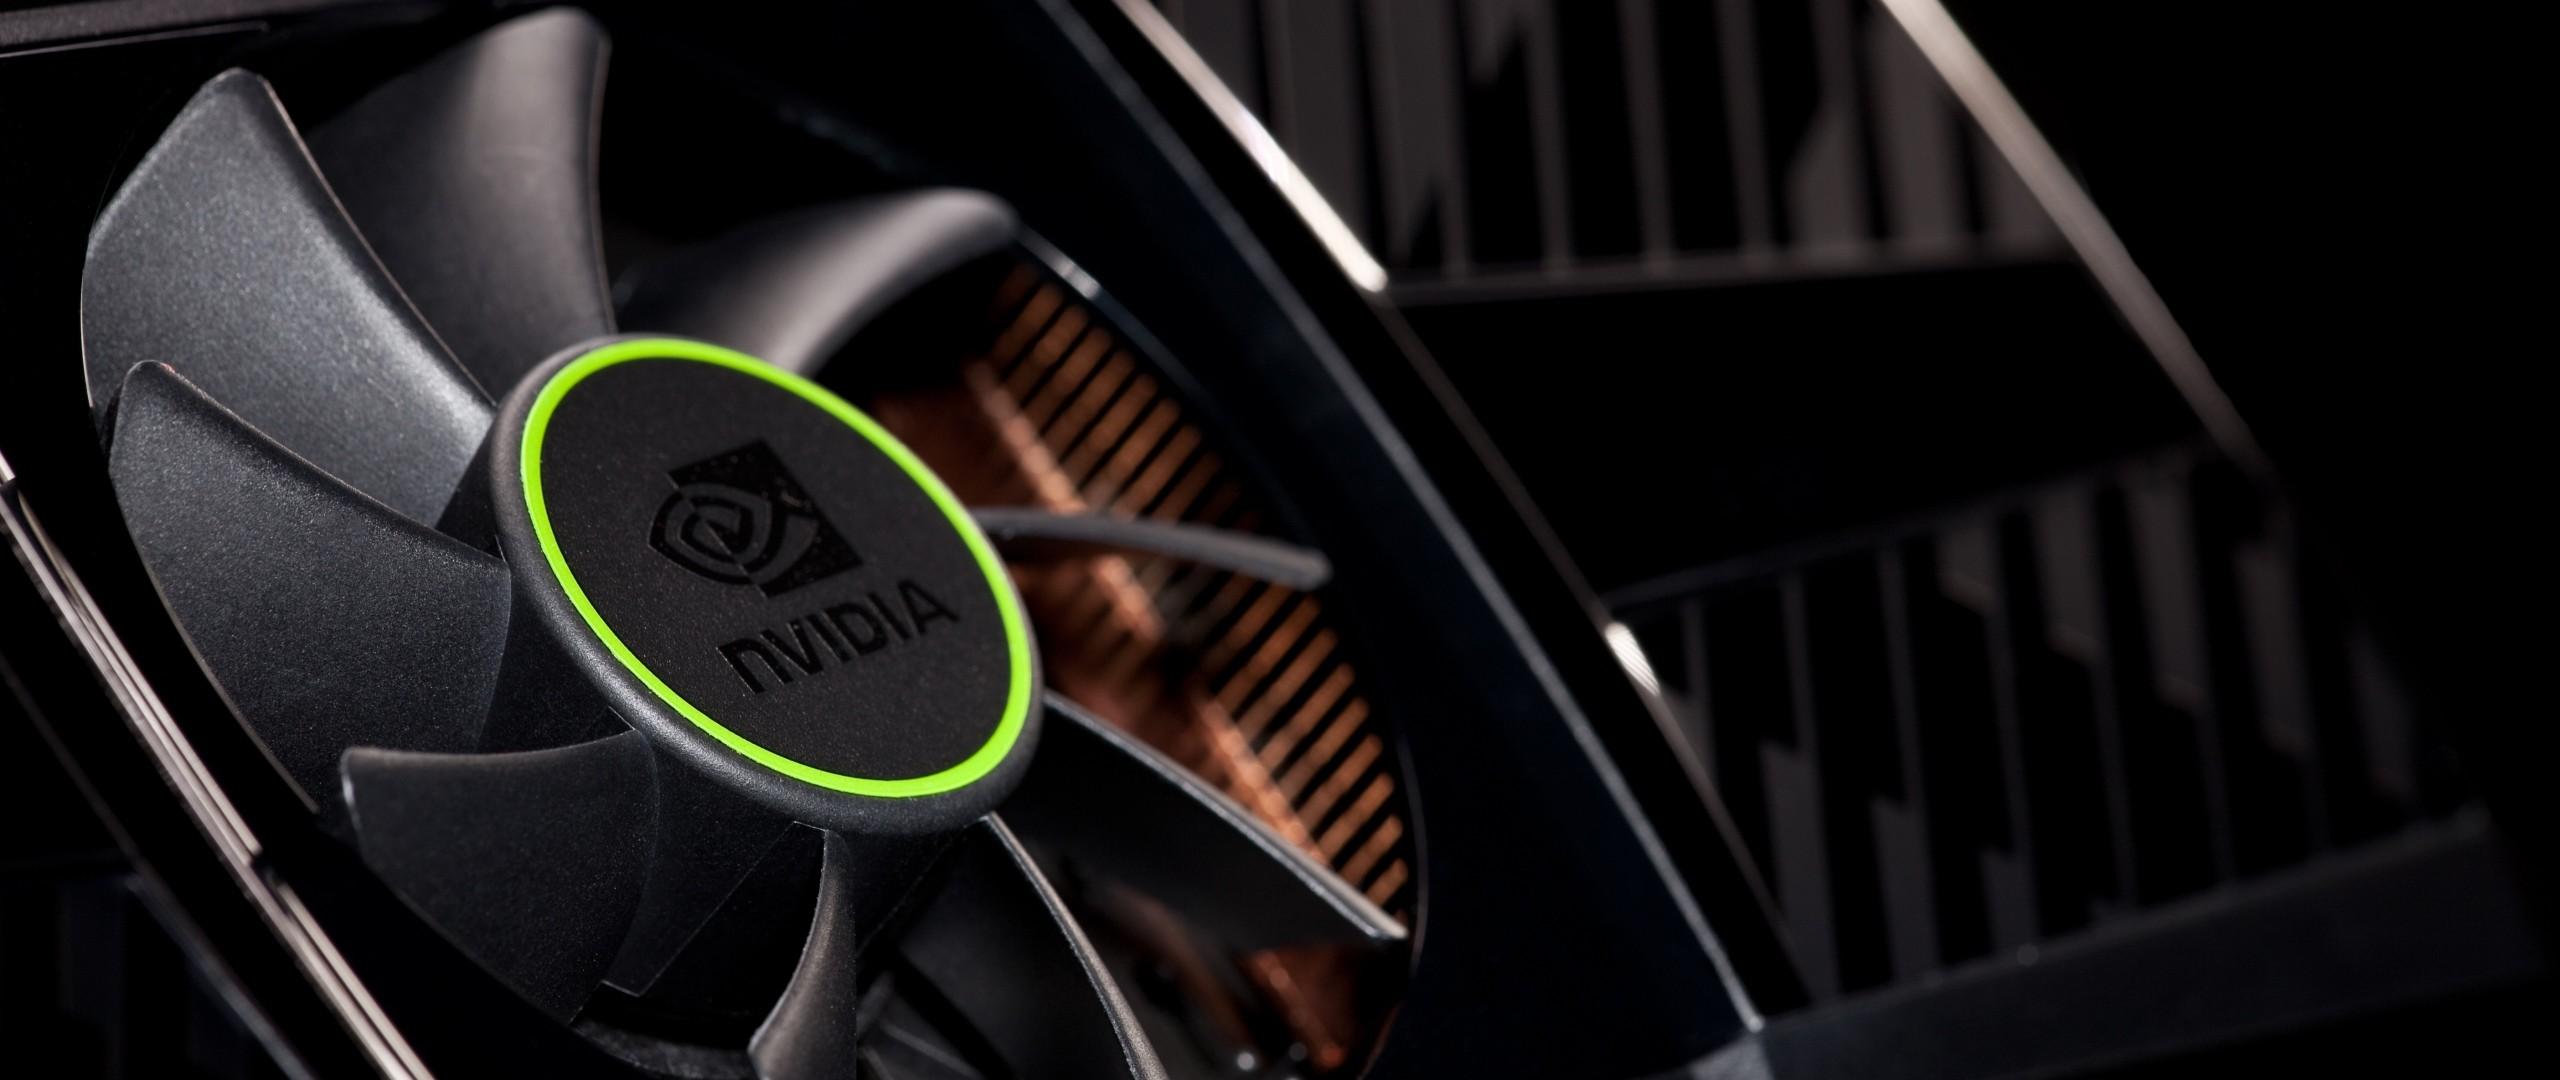 Preview wallpaper nvidia, company, vga, cooler, black, green 2560×1080